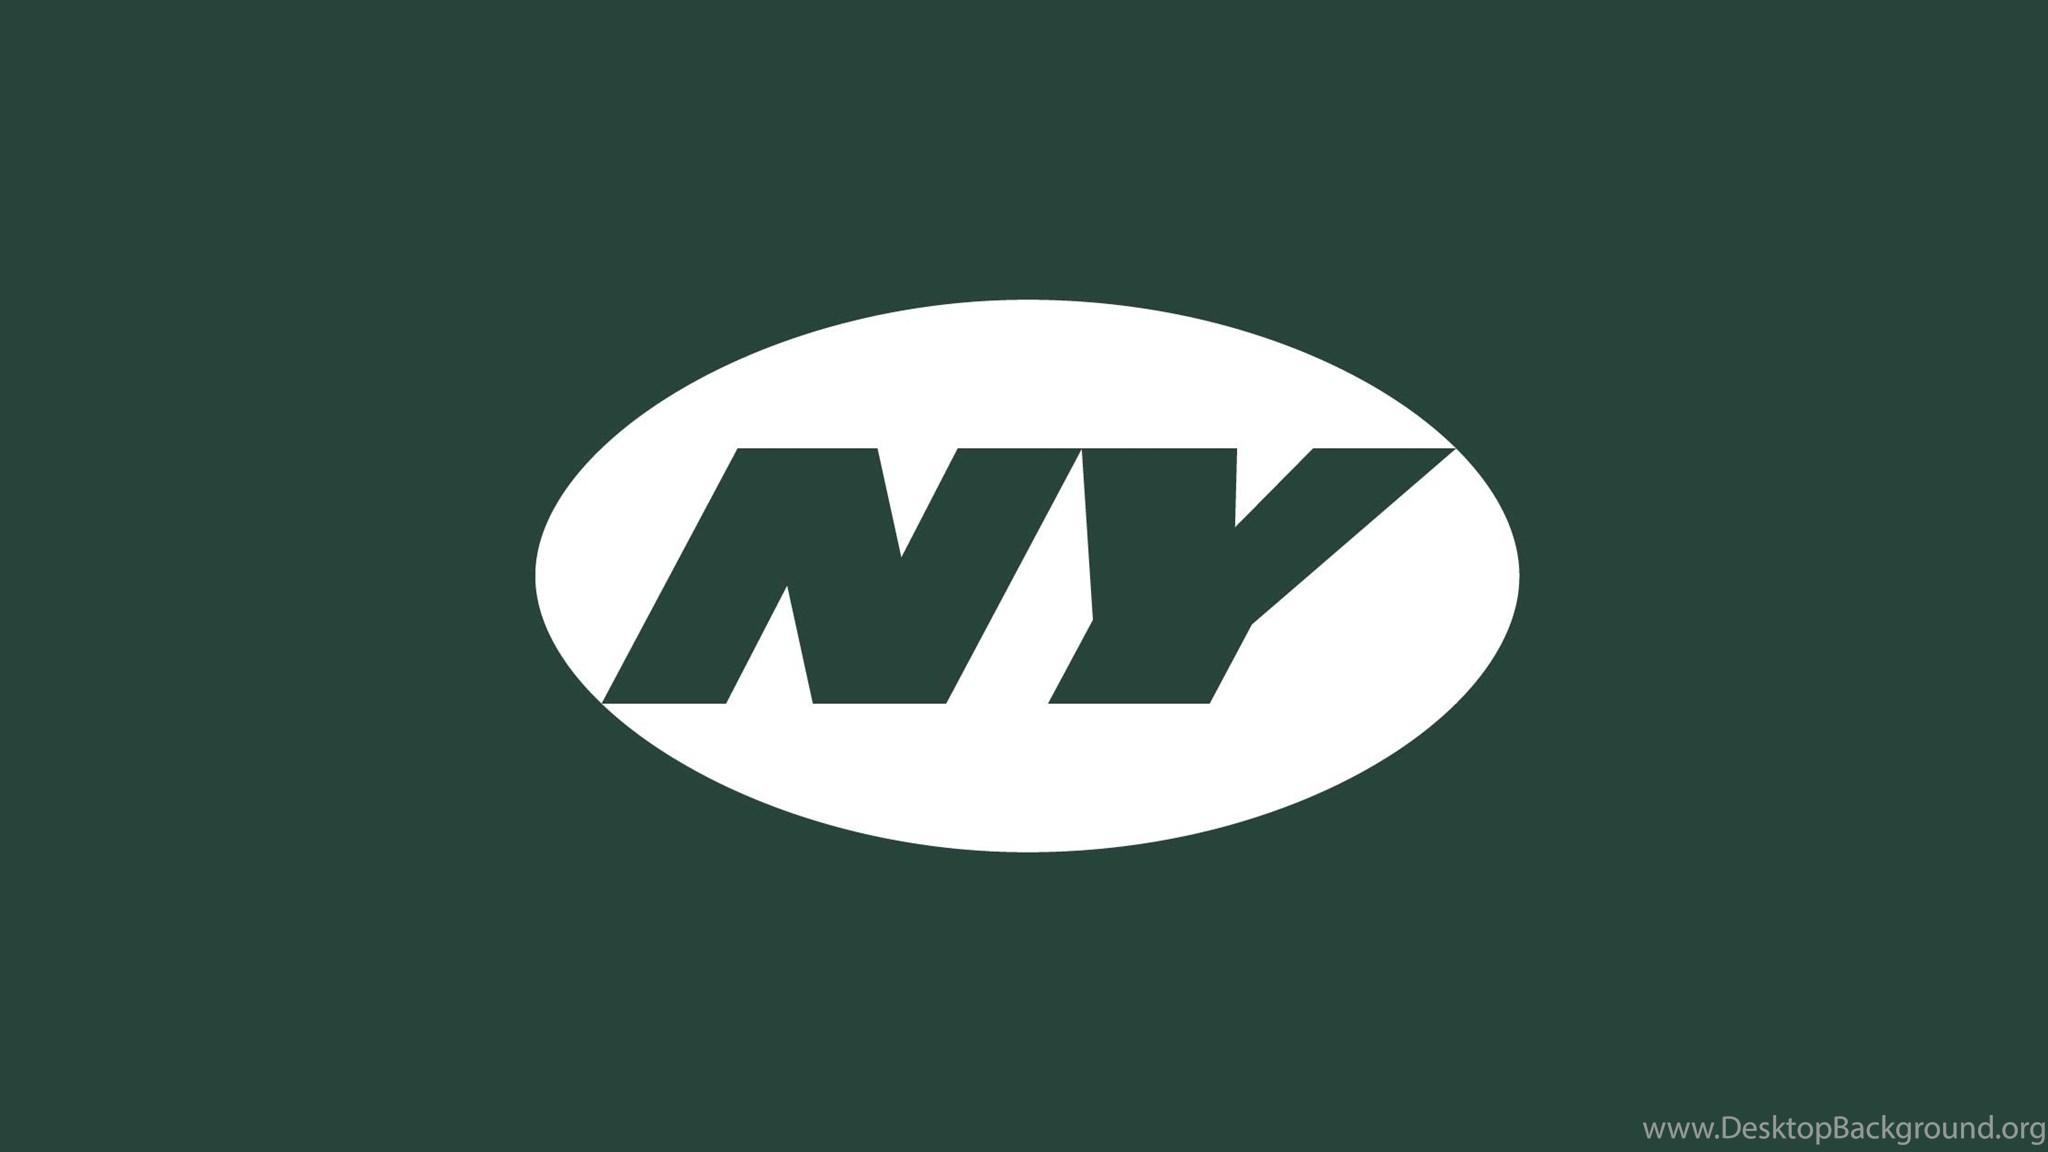 New York Jets Backgrounds Desktop Background